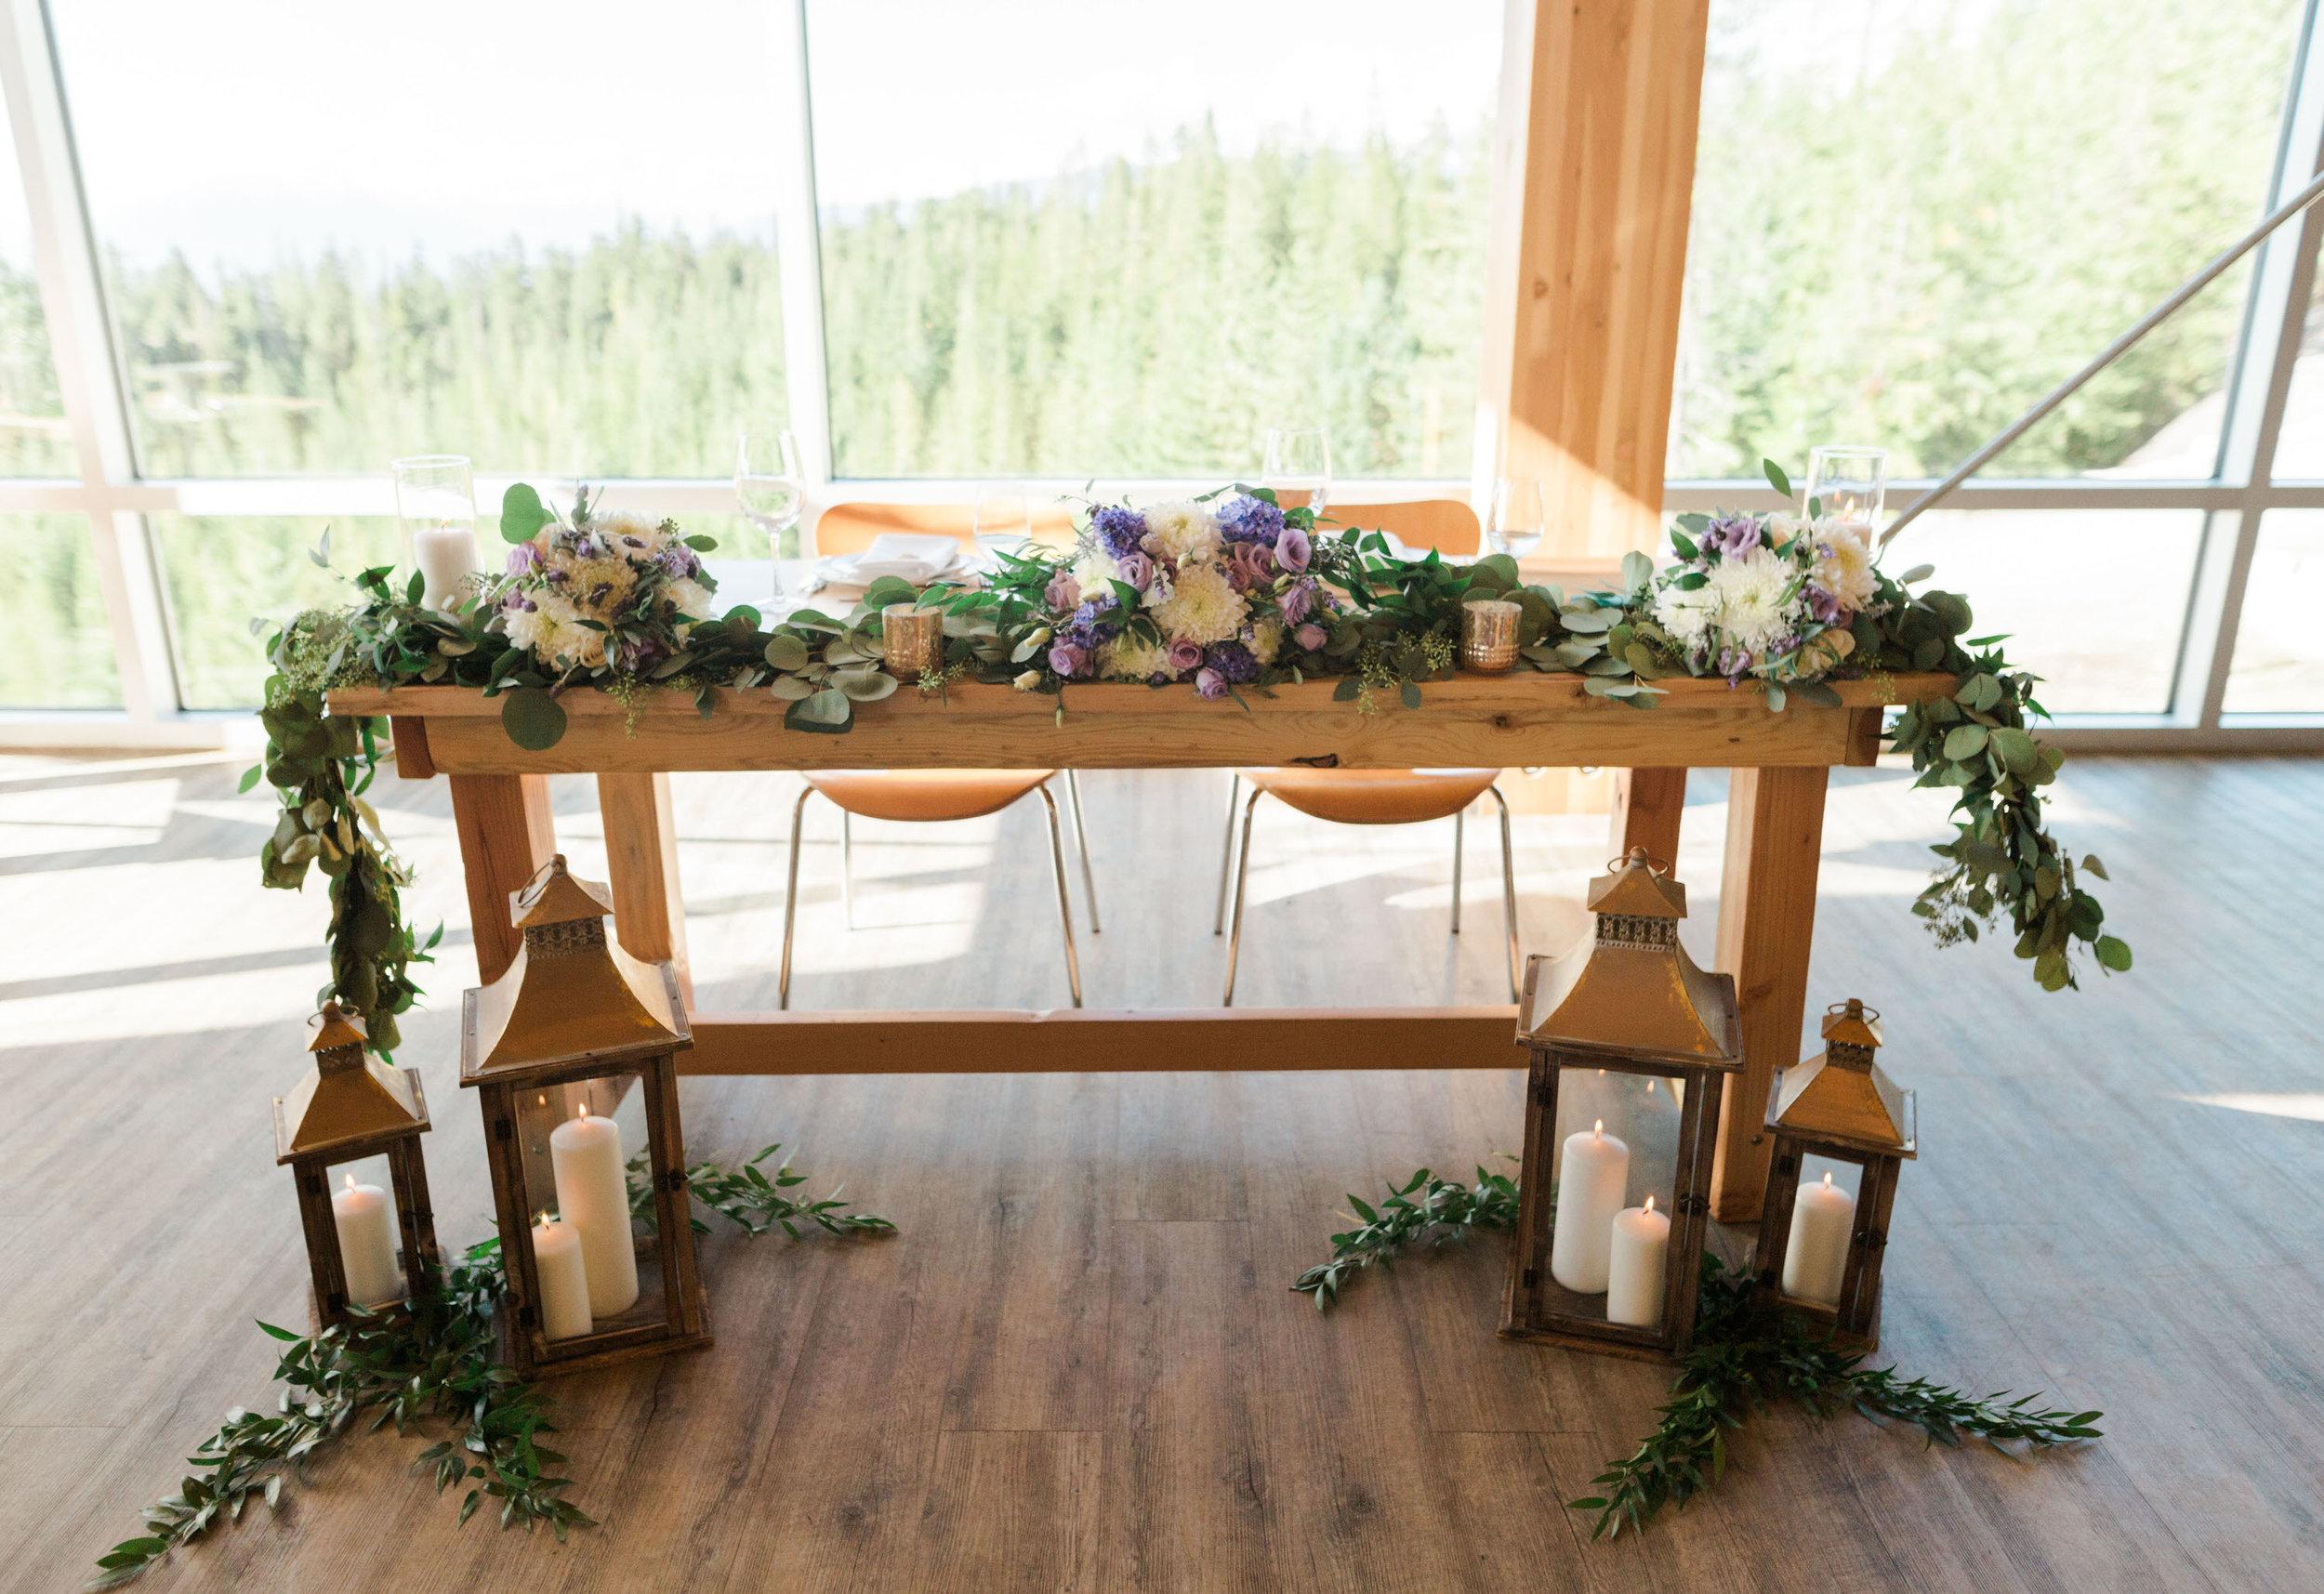 Squamish Wedding Photographer - Sea to Sky Gondola Wedding Photos -  Vancouver Wedding Photographer & Videographer - Sunshine Coast Wedding Photos - Sunshine Coast Wedding Photographer - Jennifer Picard Photography - IMG_4080.jpg